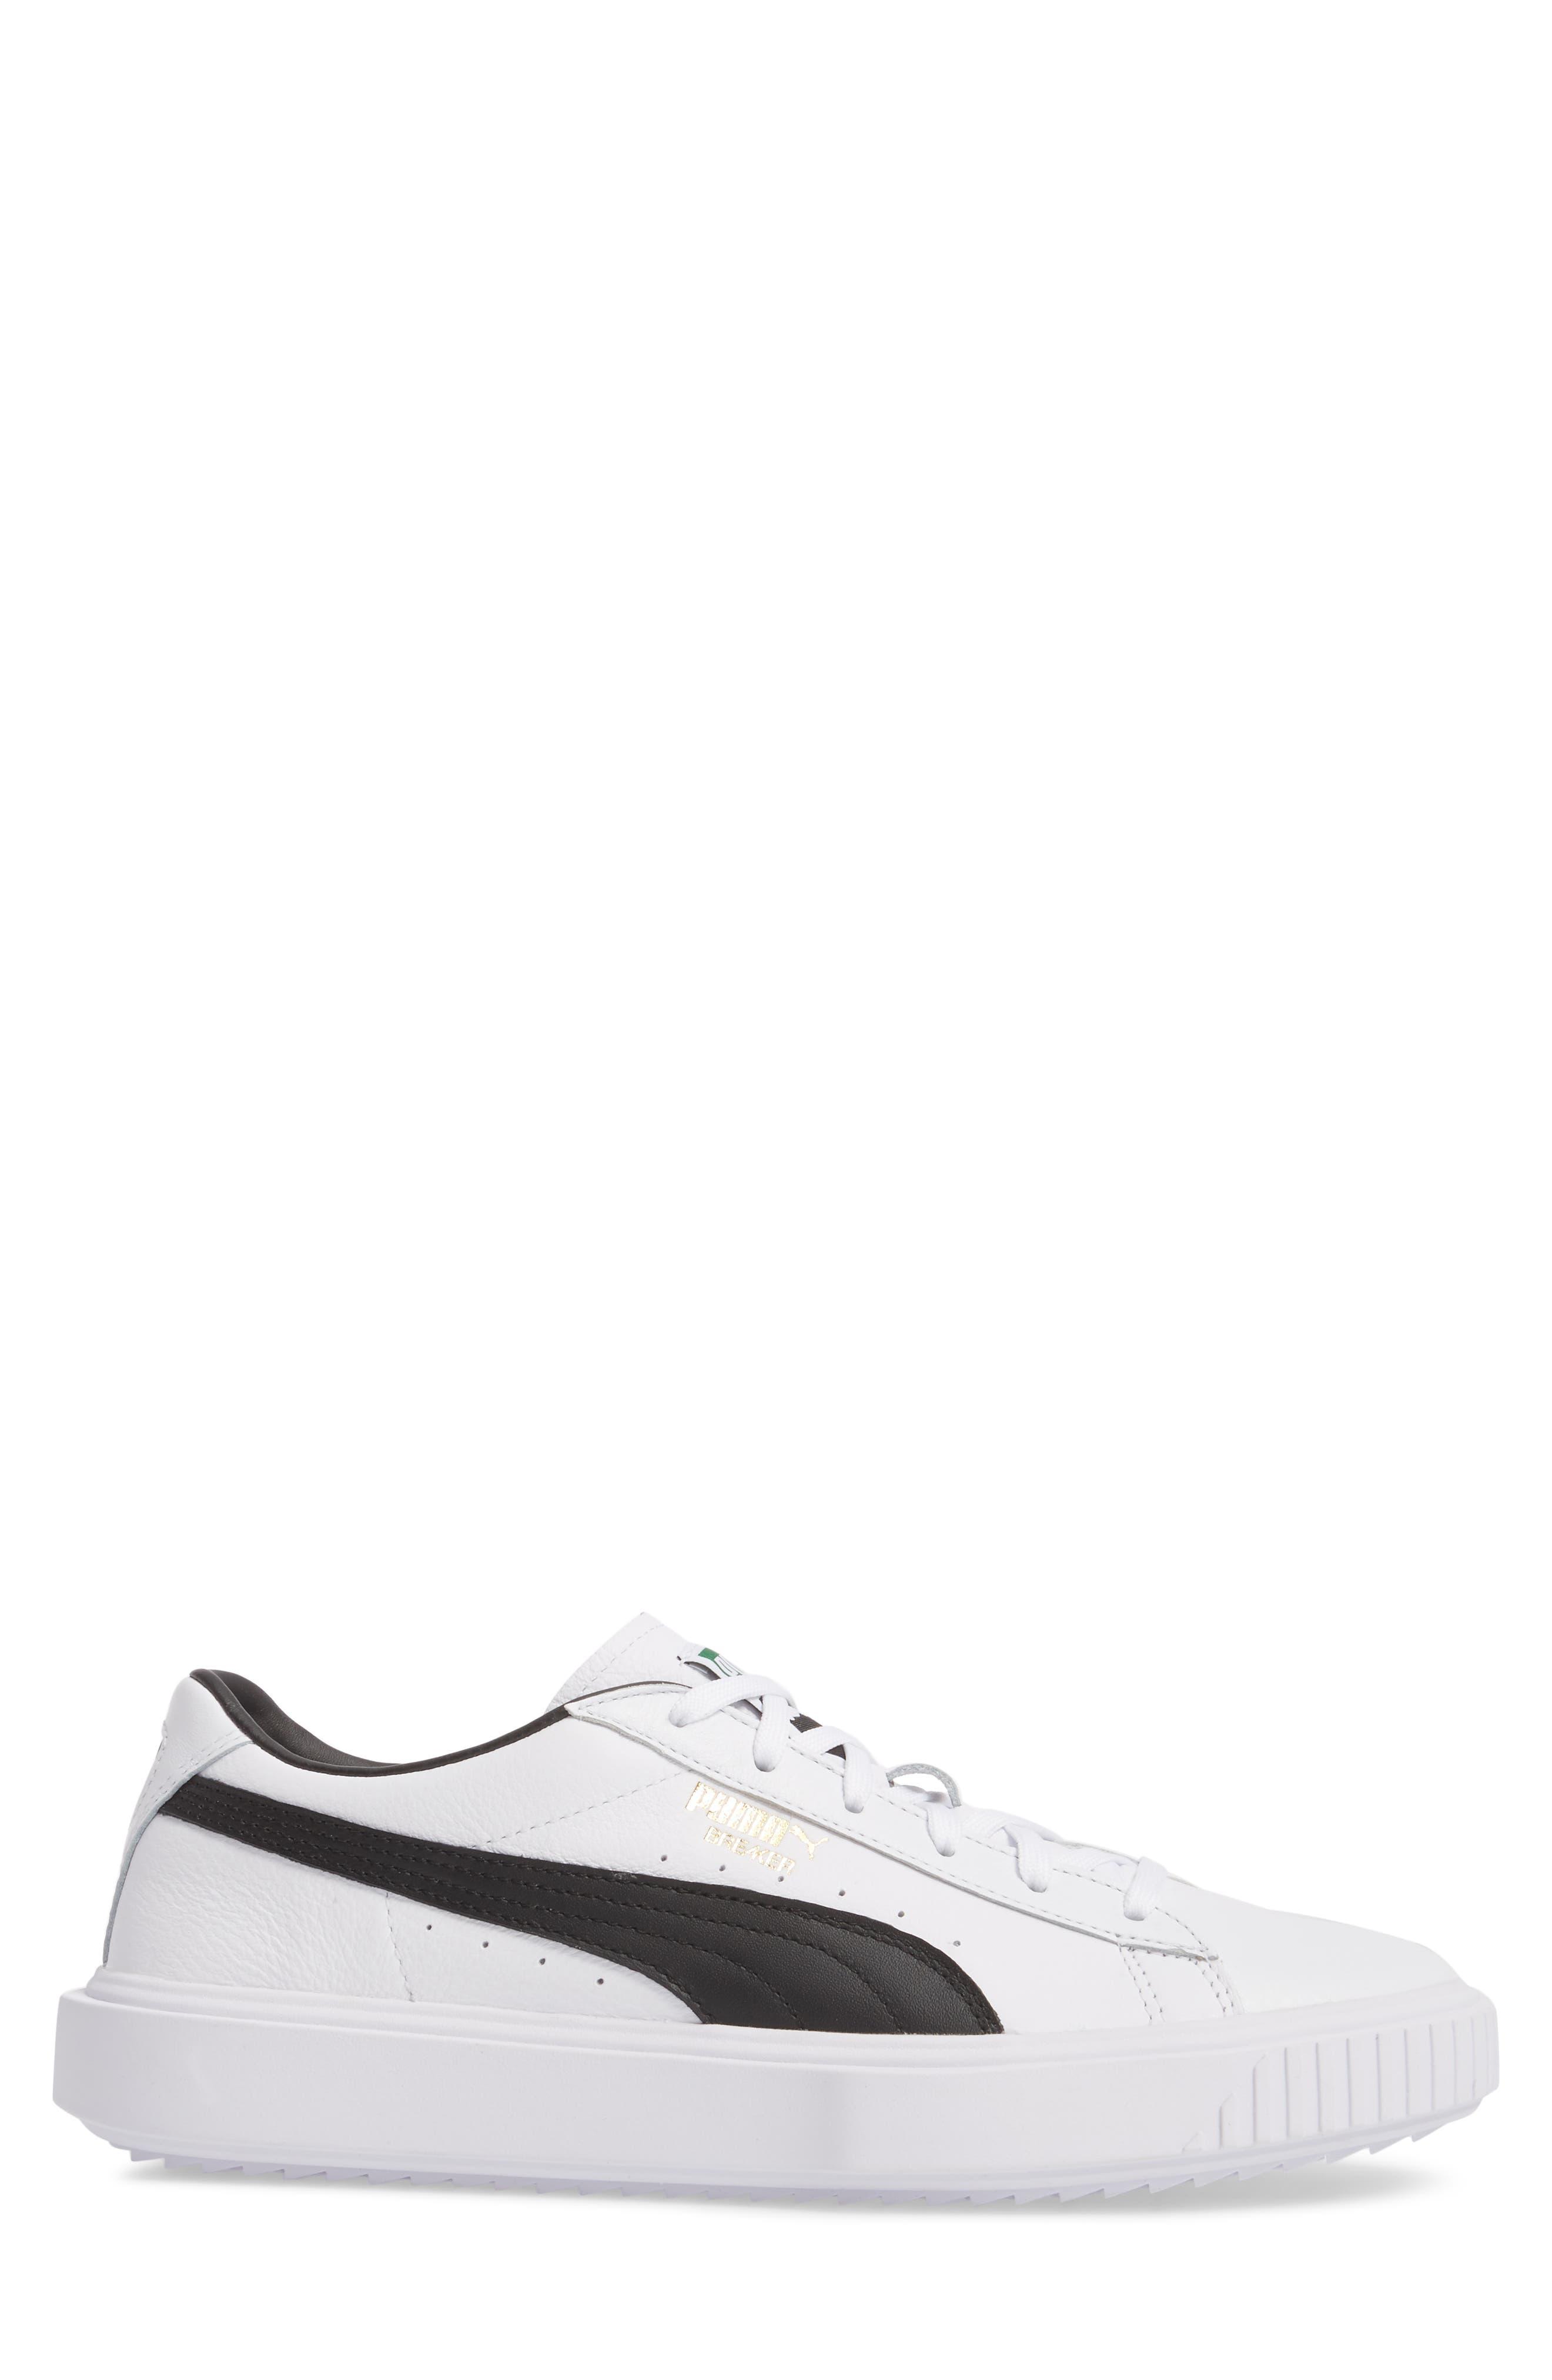 Breaker Low Top Sneaker,                             Alternate thumbnail 3, color,                             WHITE/ BLACK LEATHER